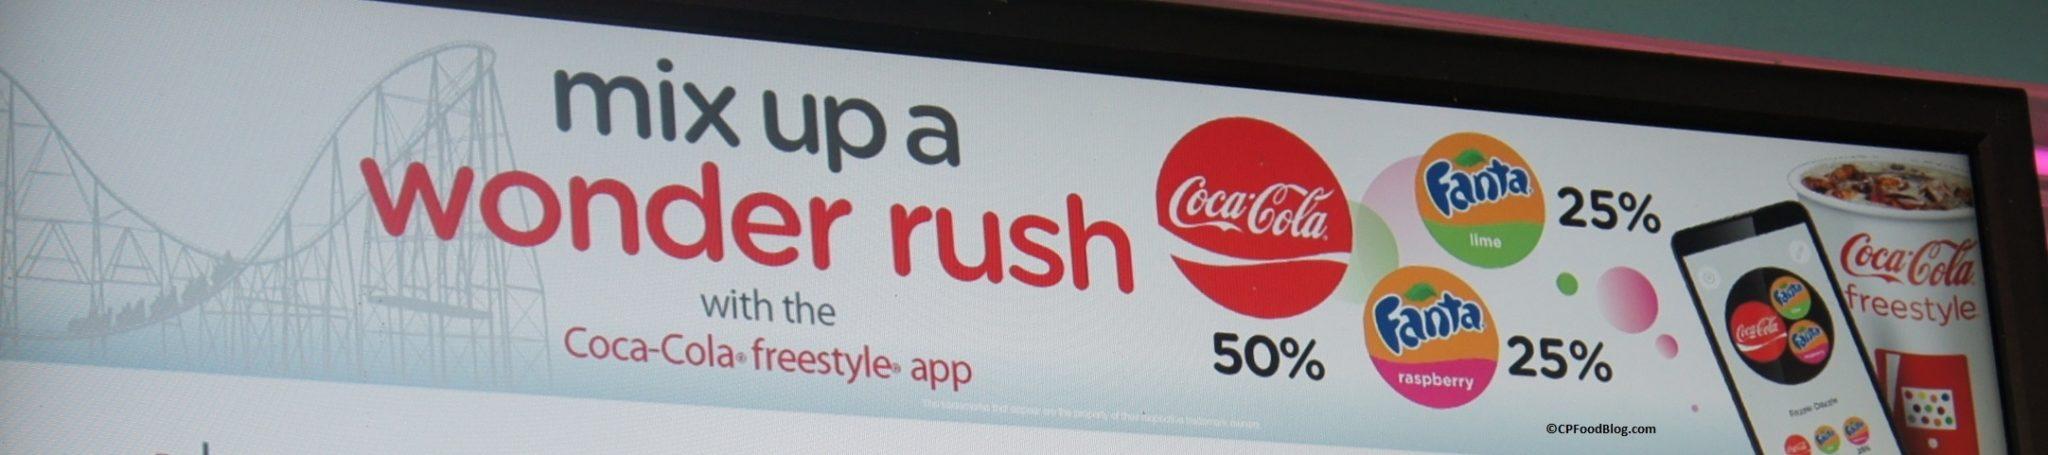 160625 Canada's Wonderland Wonder Rush Freestyle Recipe